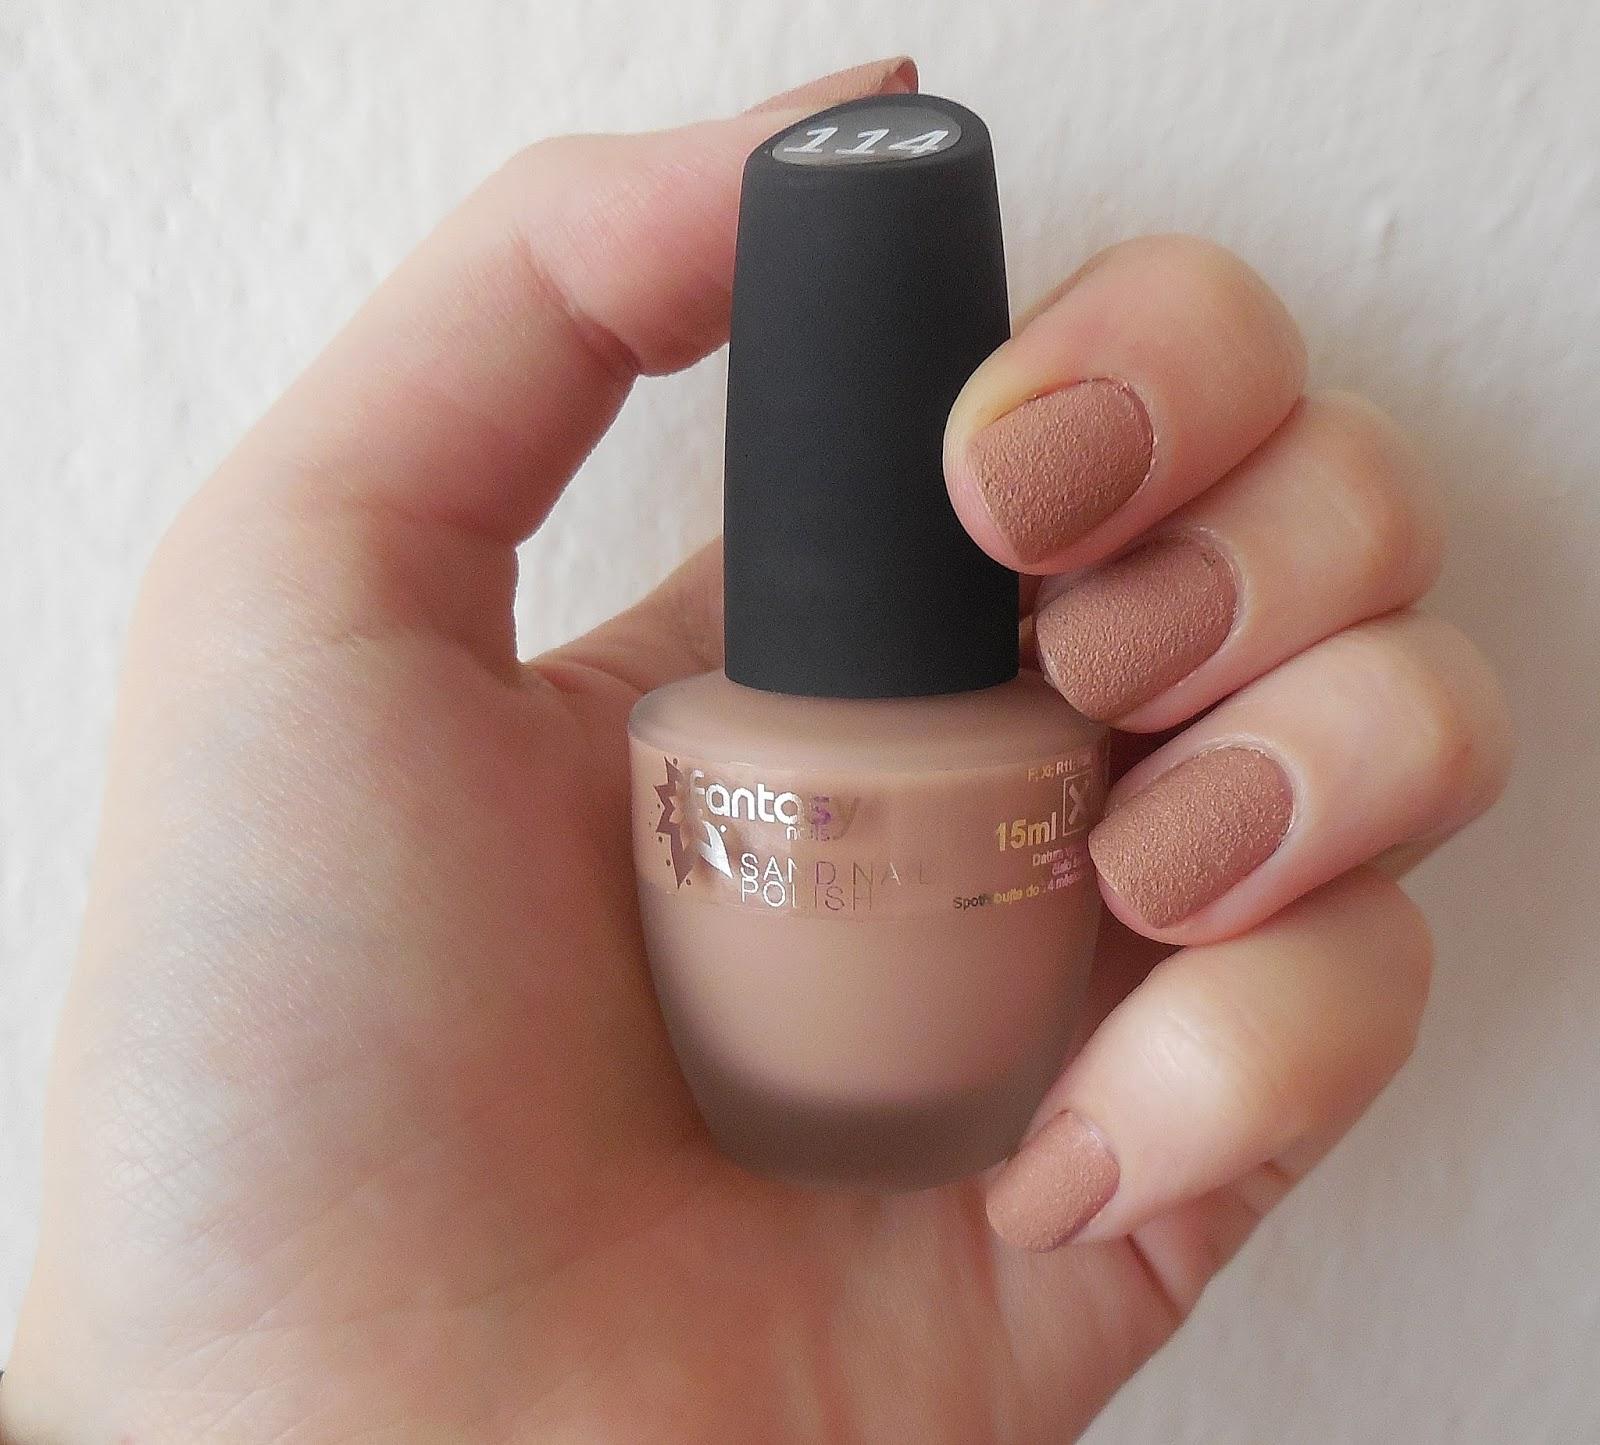 Kosmetika Recenze Blog Blogspot Cz Krasny Nude Piskovy Lak Fantasy Nails